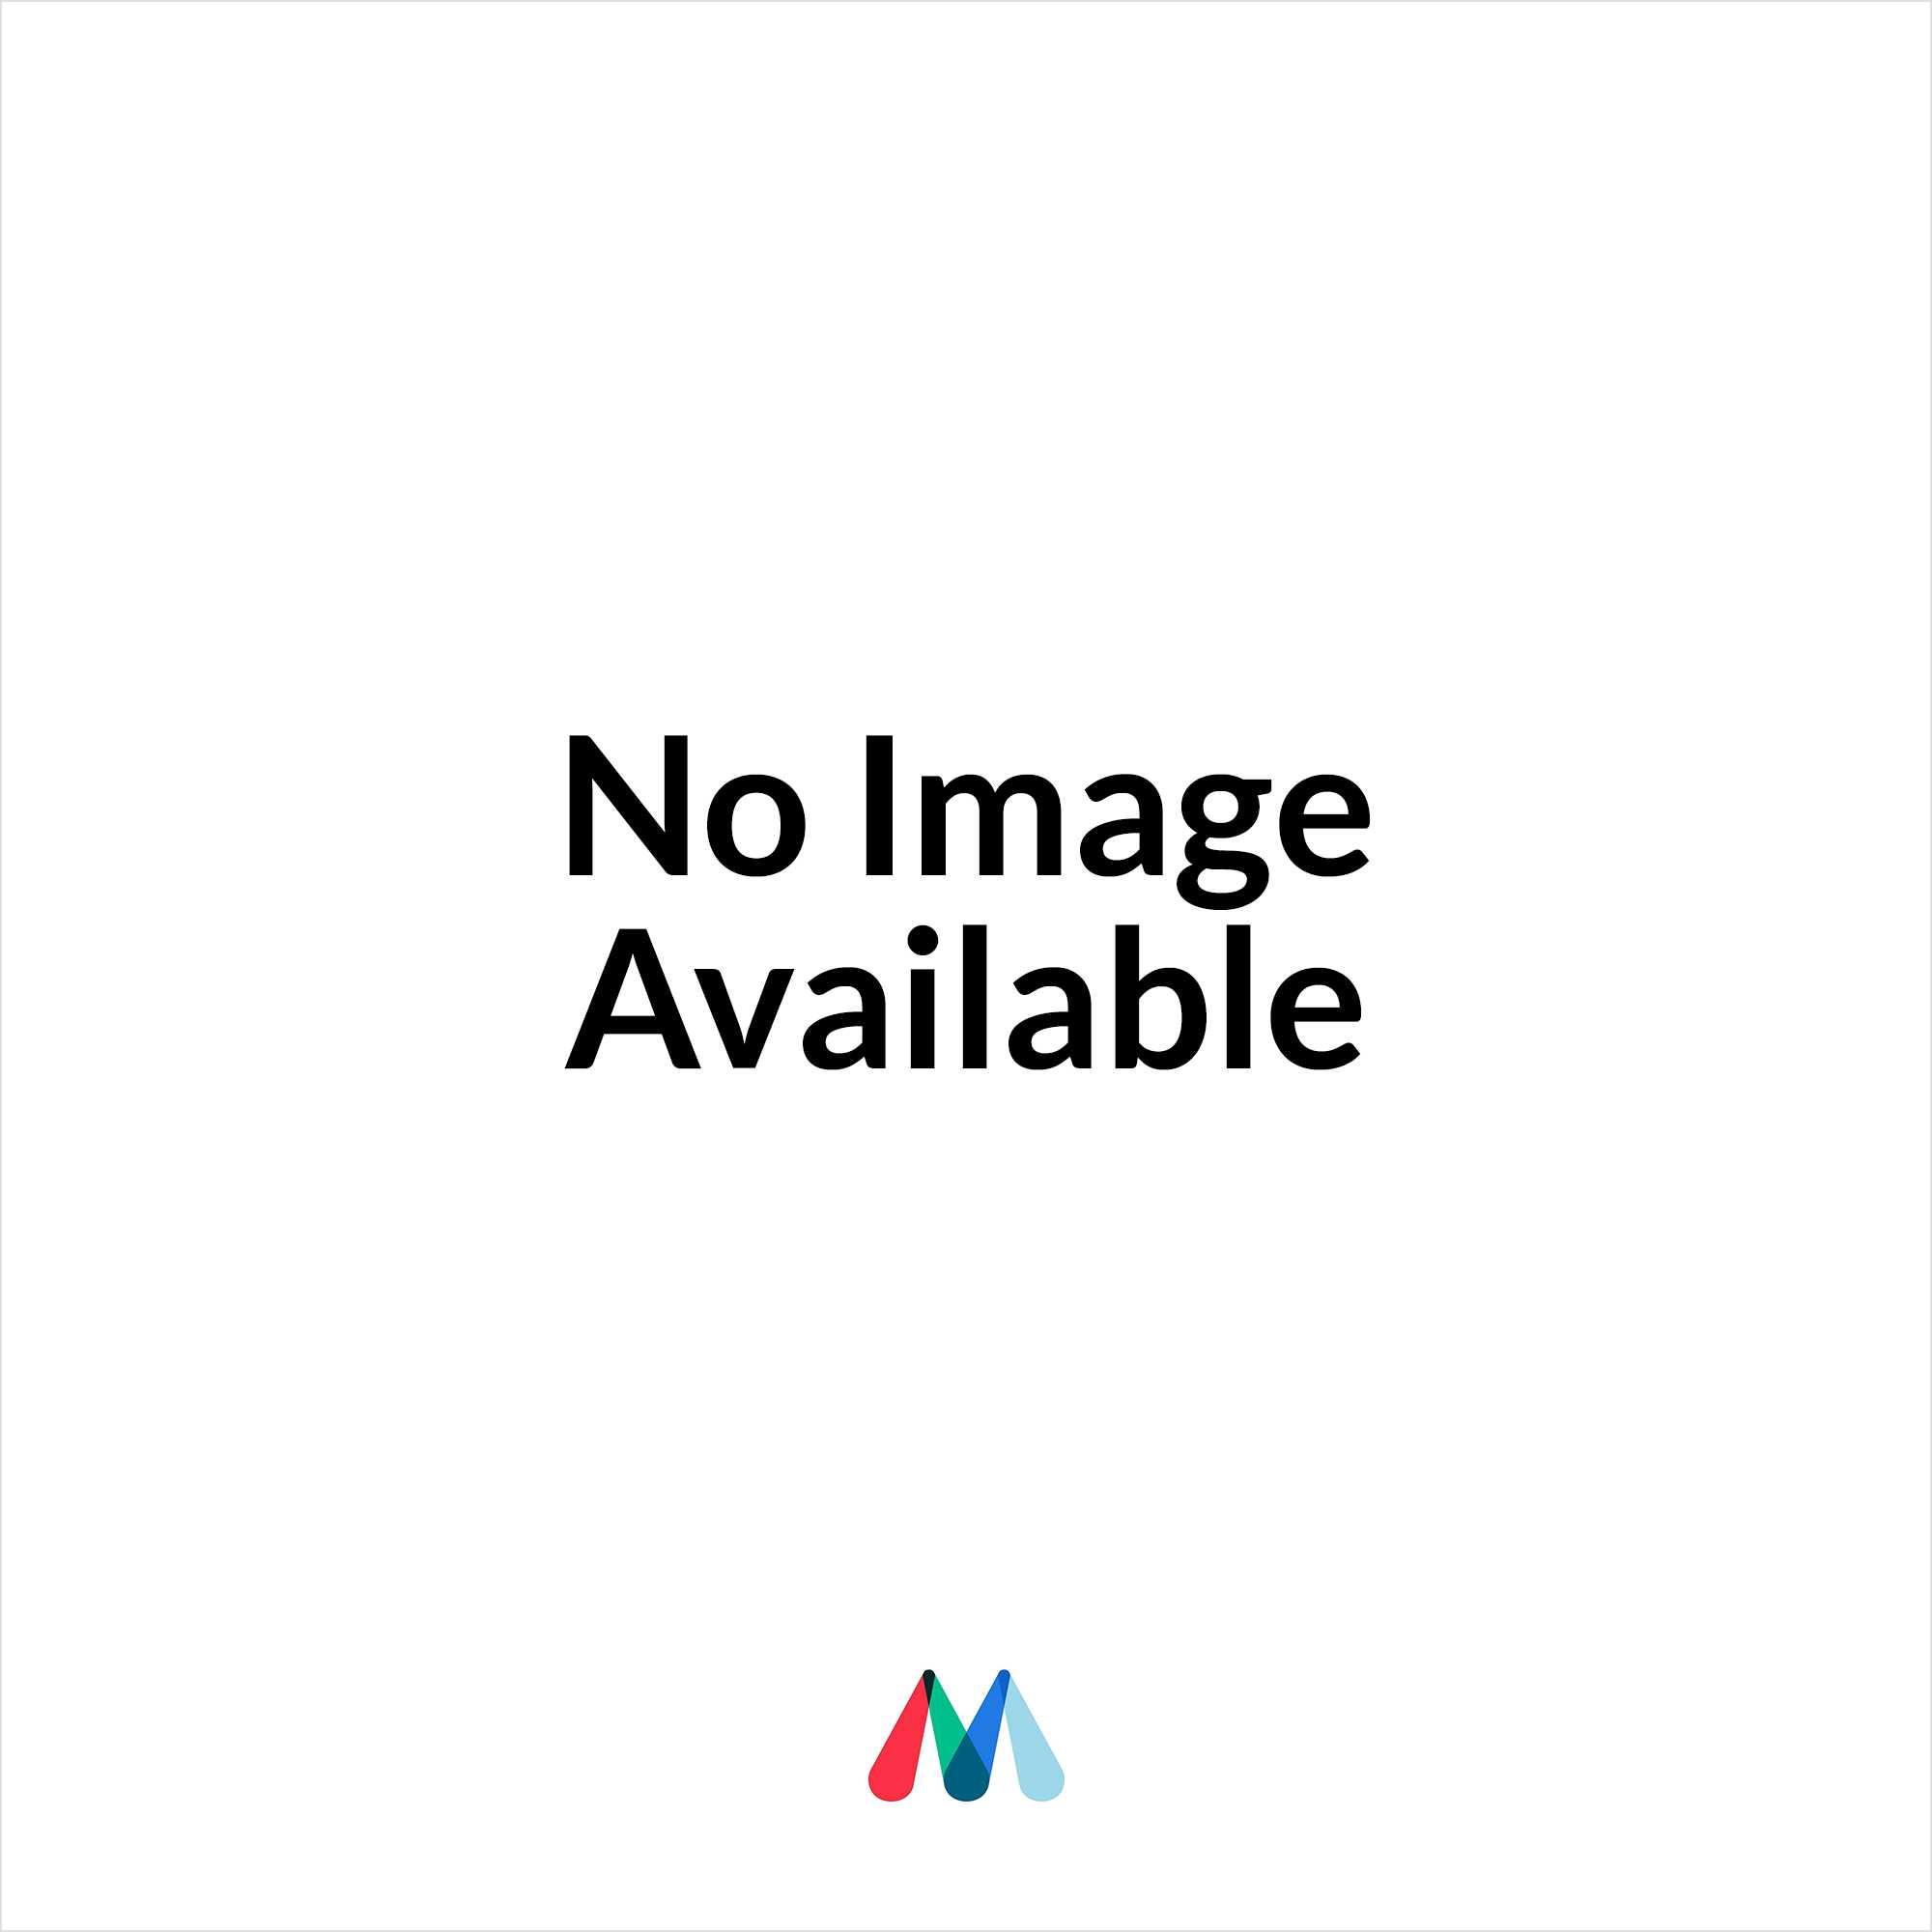 Collingwood Lighting ML02 decorative LED mini light - Stainless steel - Low voltage